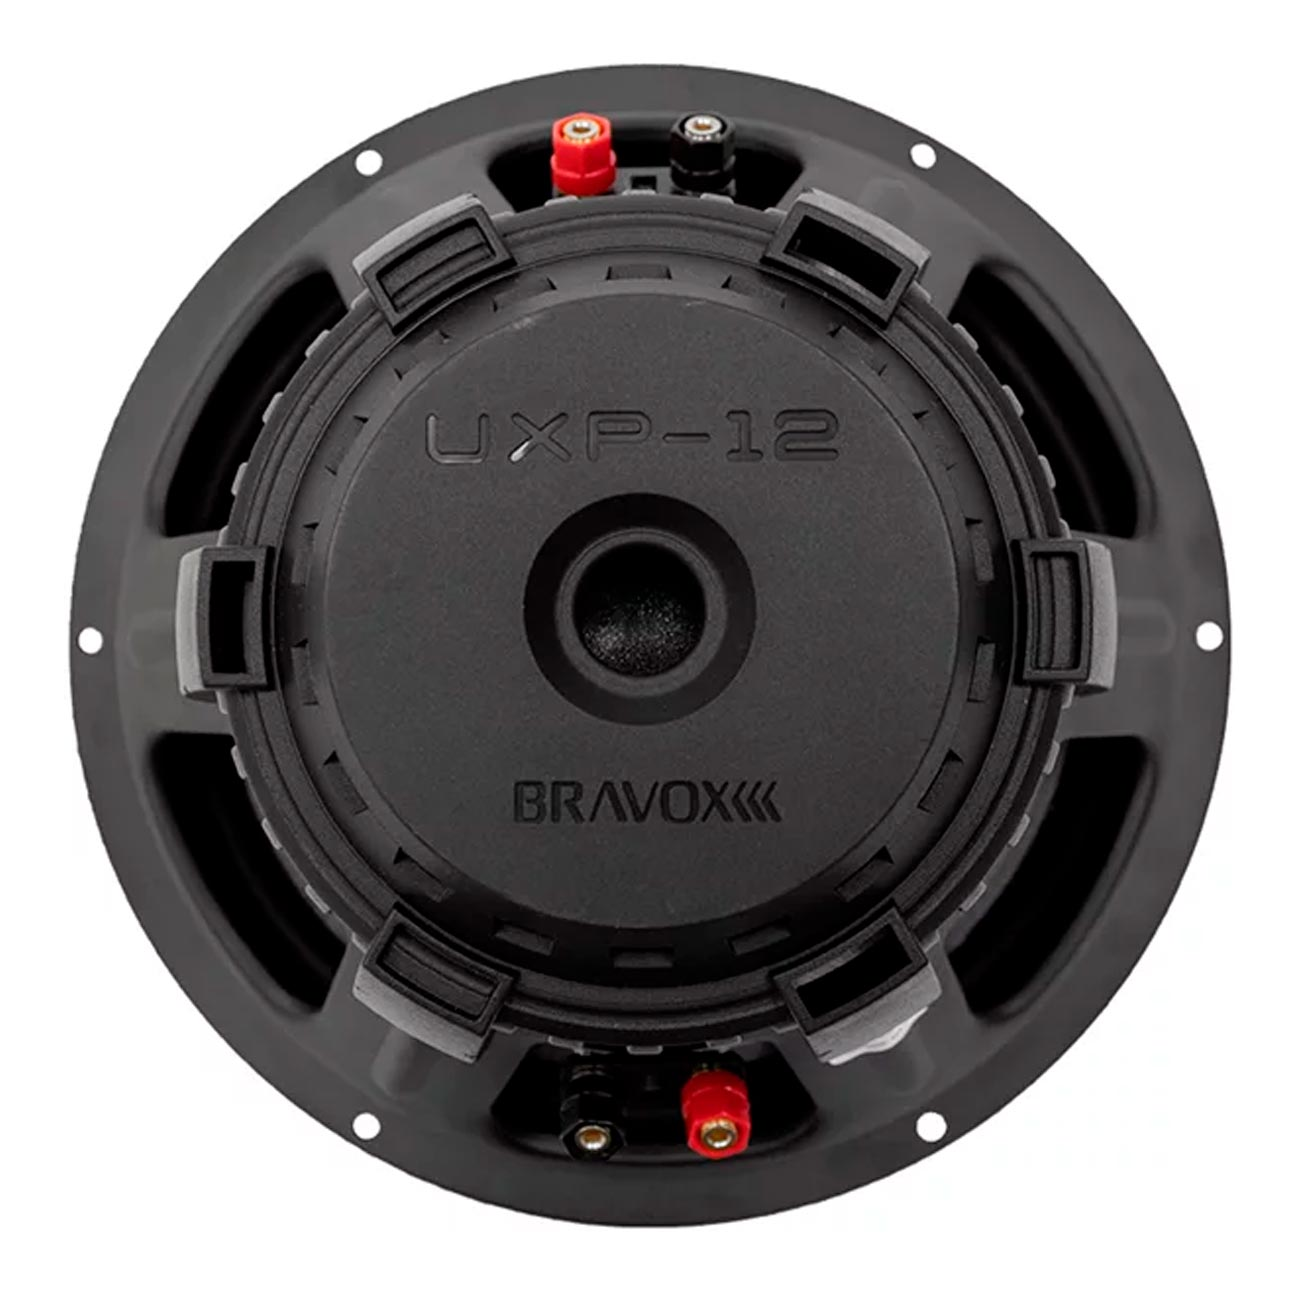 Alto Falante Bravox 12 Polegadas UXP12-D4 Subwoofer